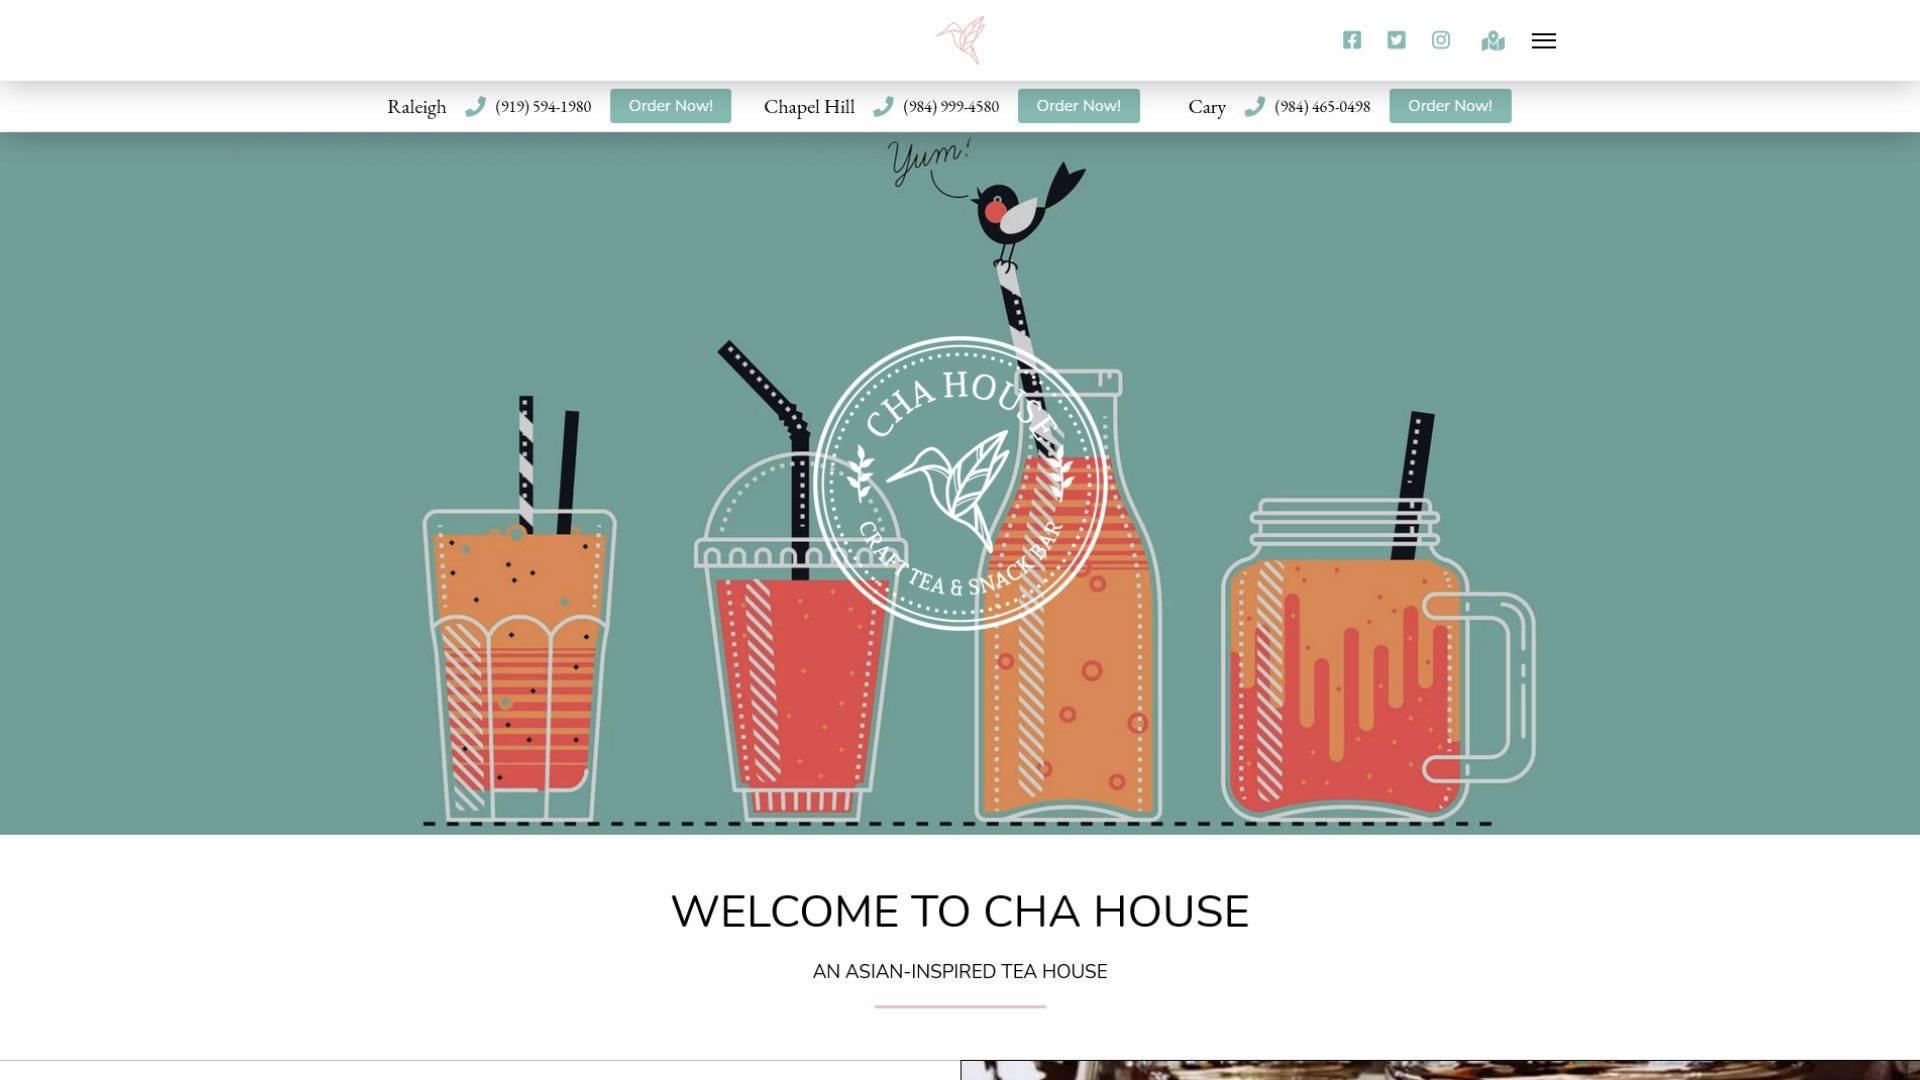 Cha House Case Study Placeholder Image